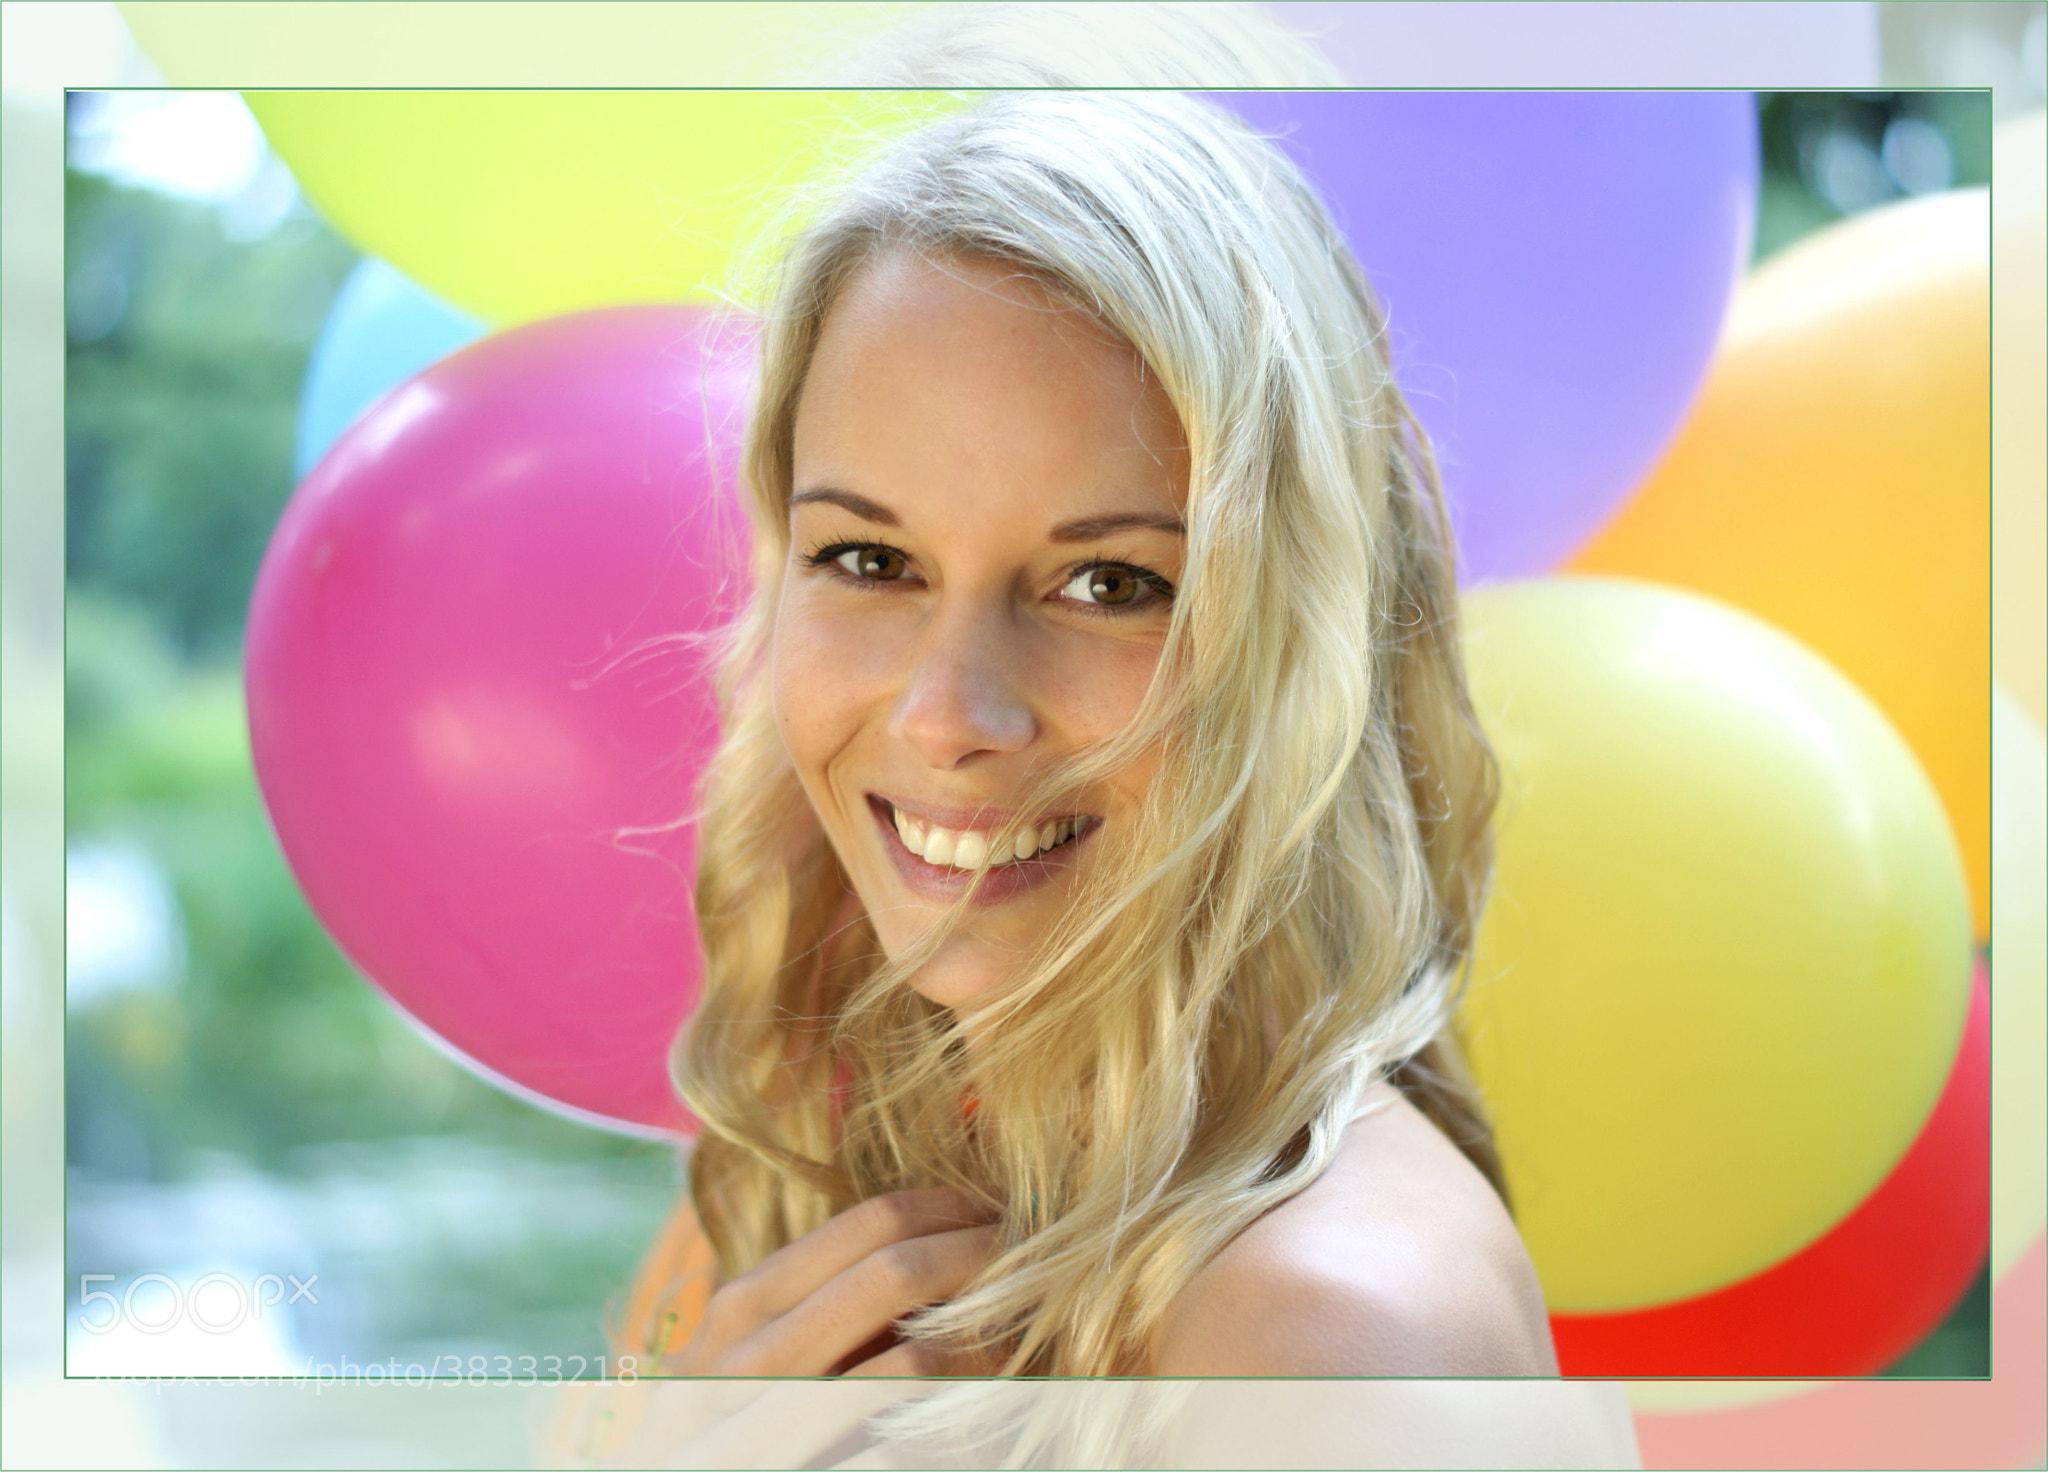 Photograph Summer Feeling by Mayera Heij on 500px